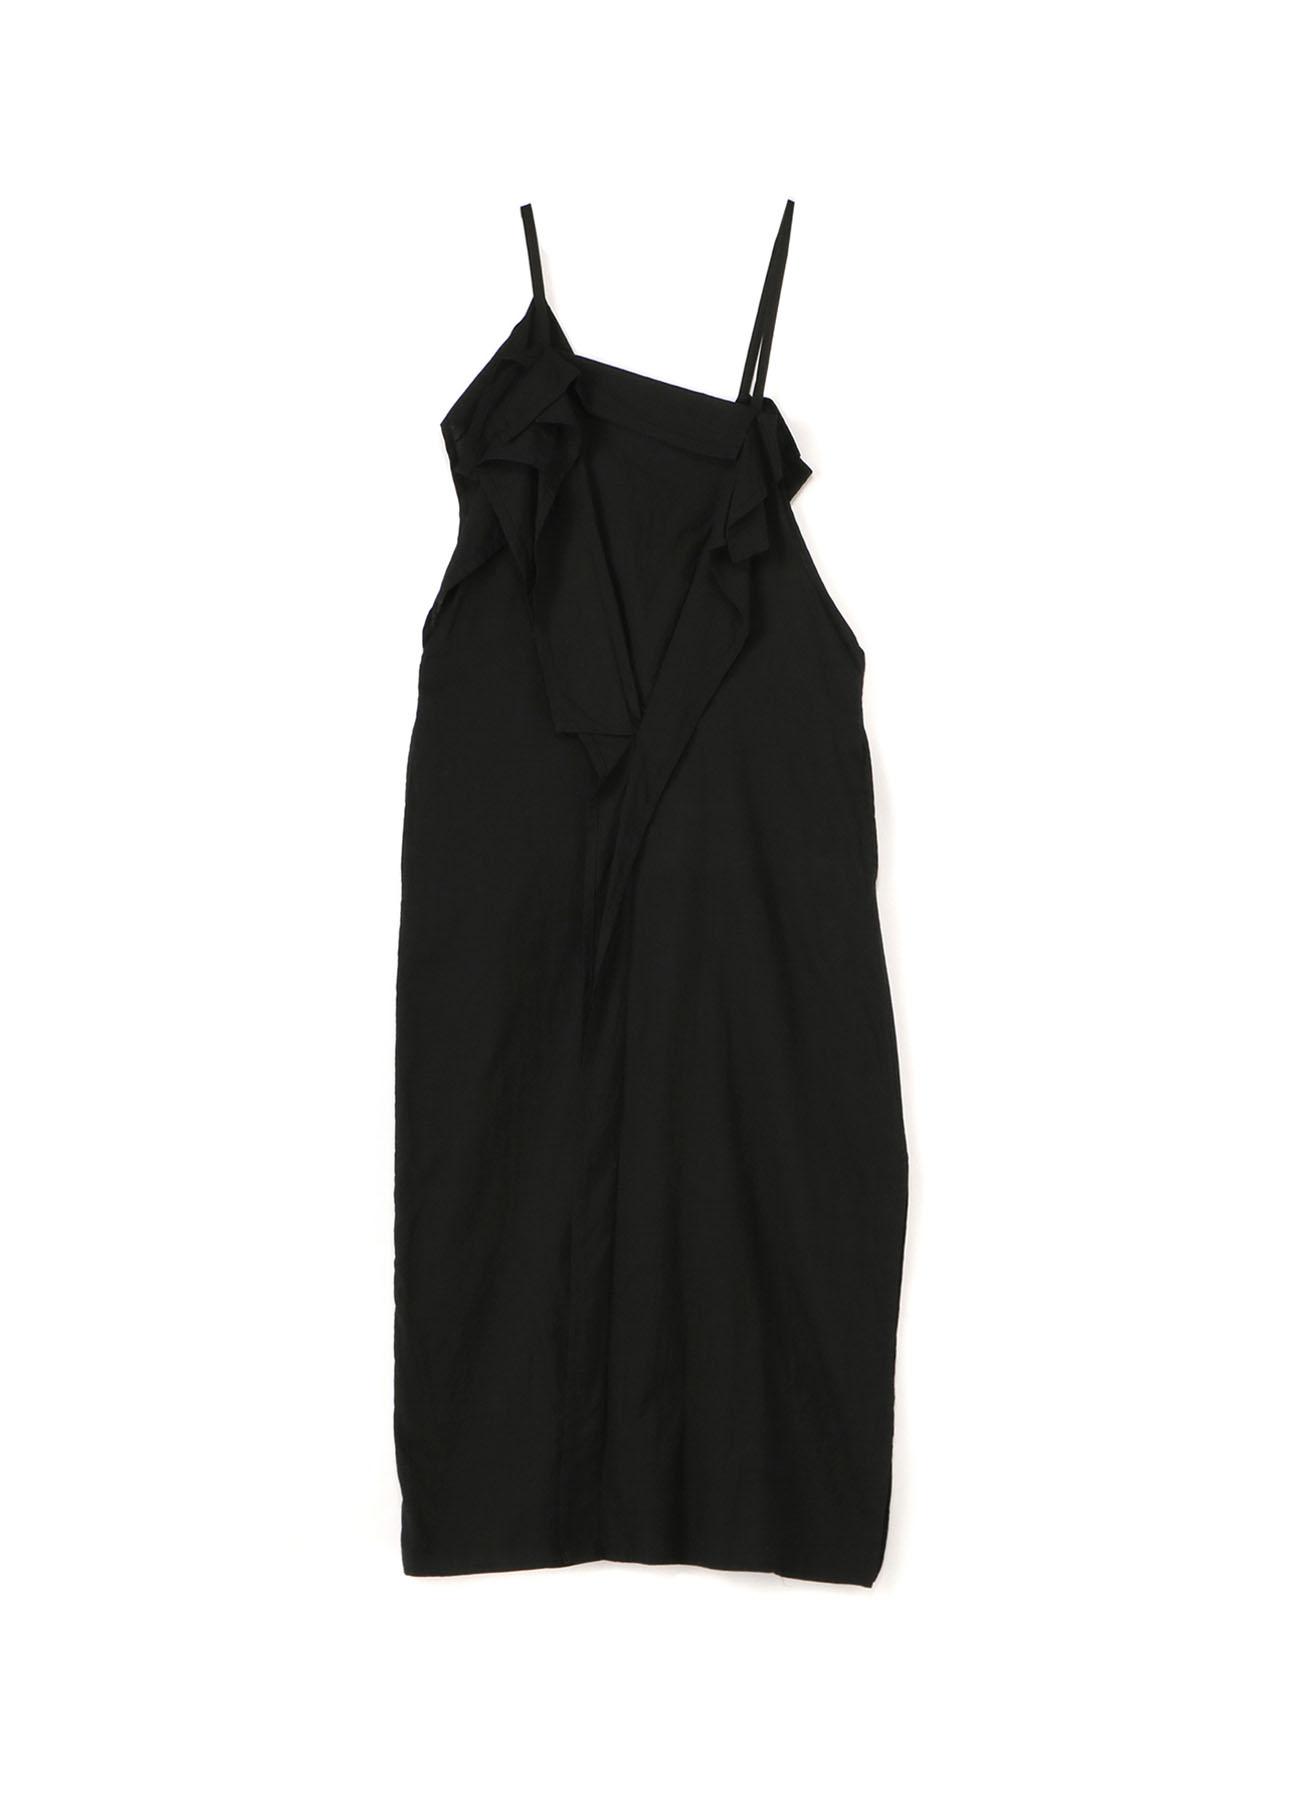 Khadi Square Cami Dress